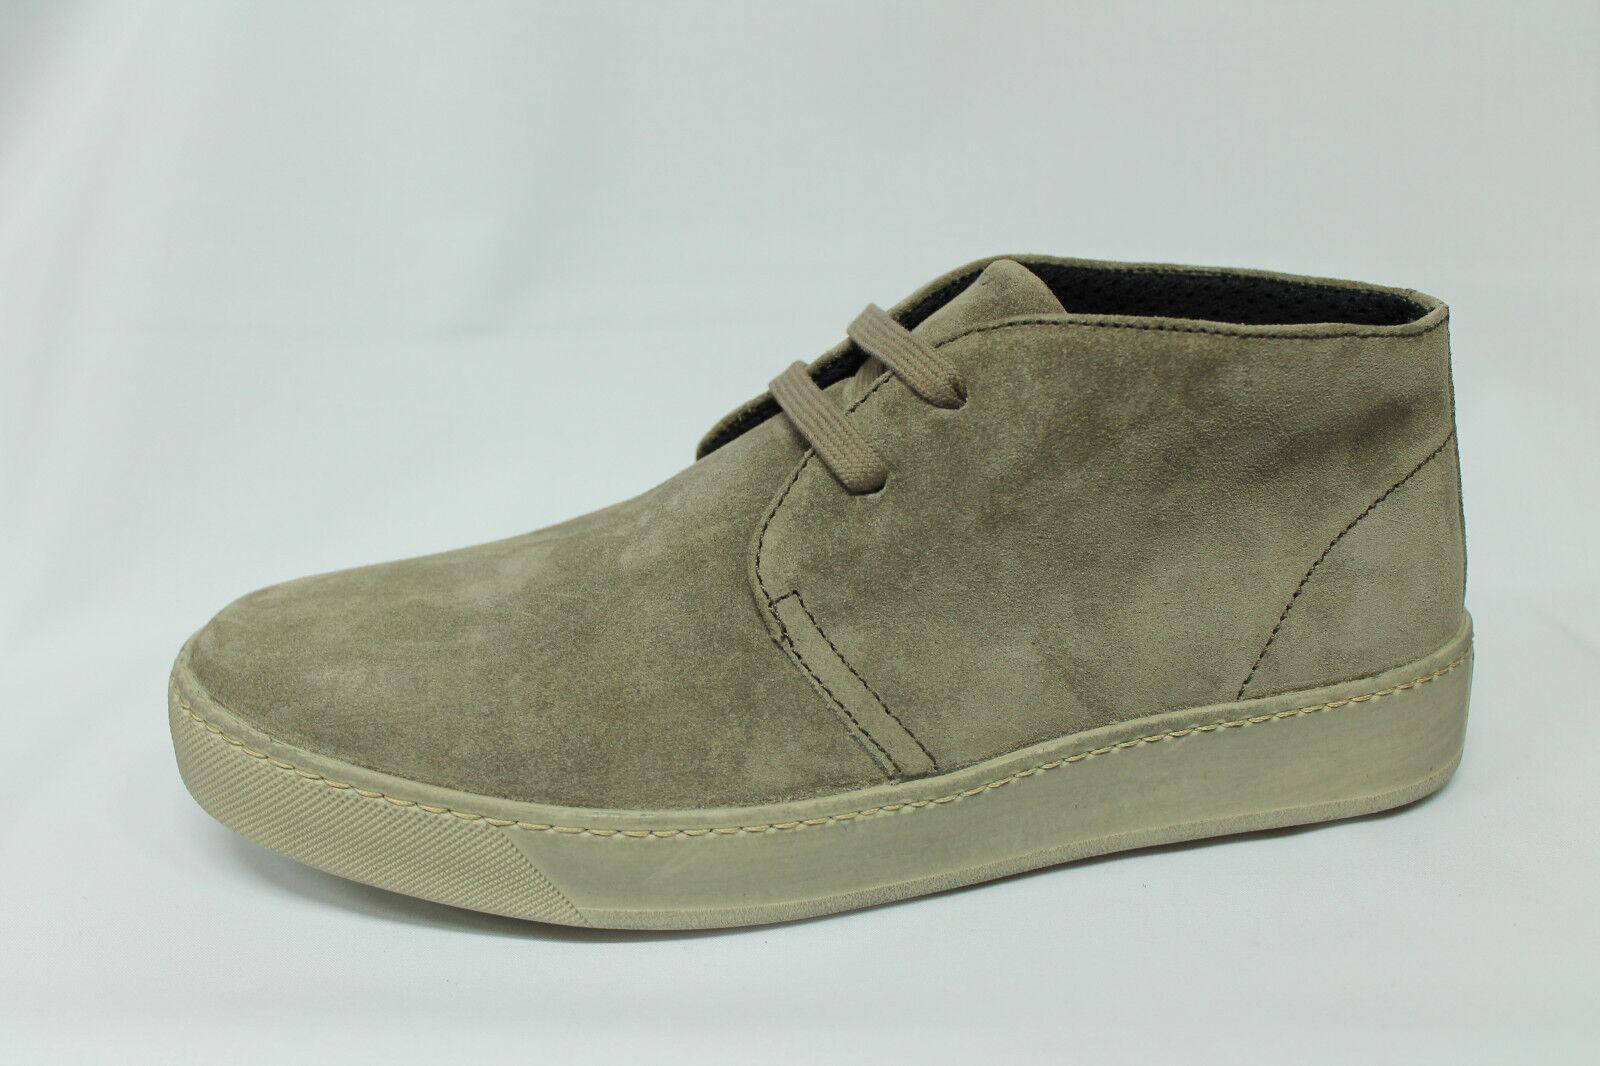 Scarpe casual da uomo  Sneakers alte polacchini Frau 20B5 torba Made in Italy listino€95 - 20%